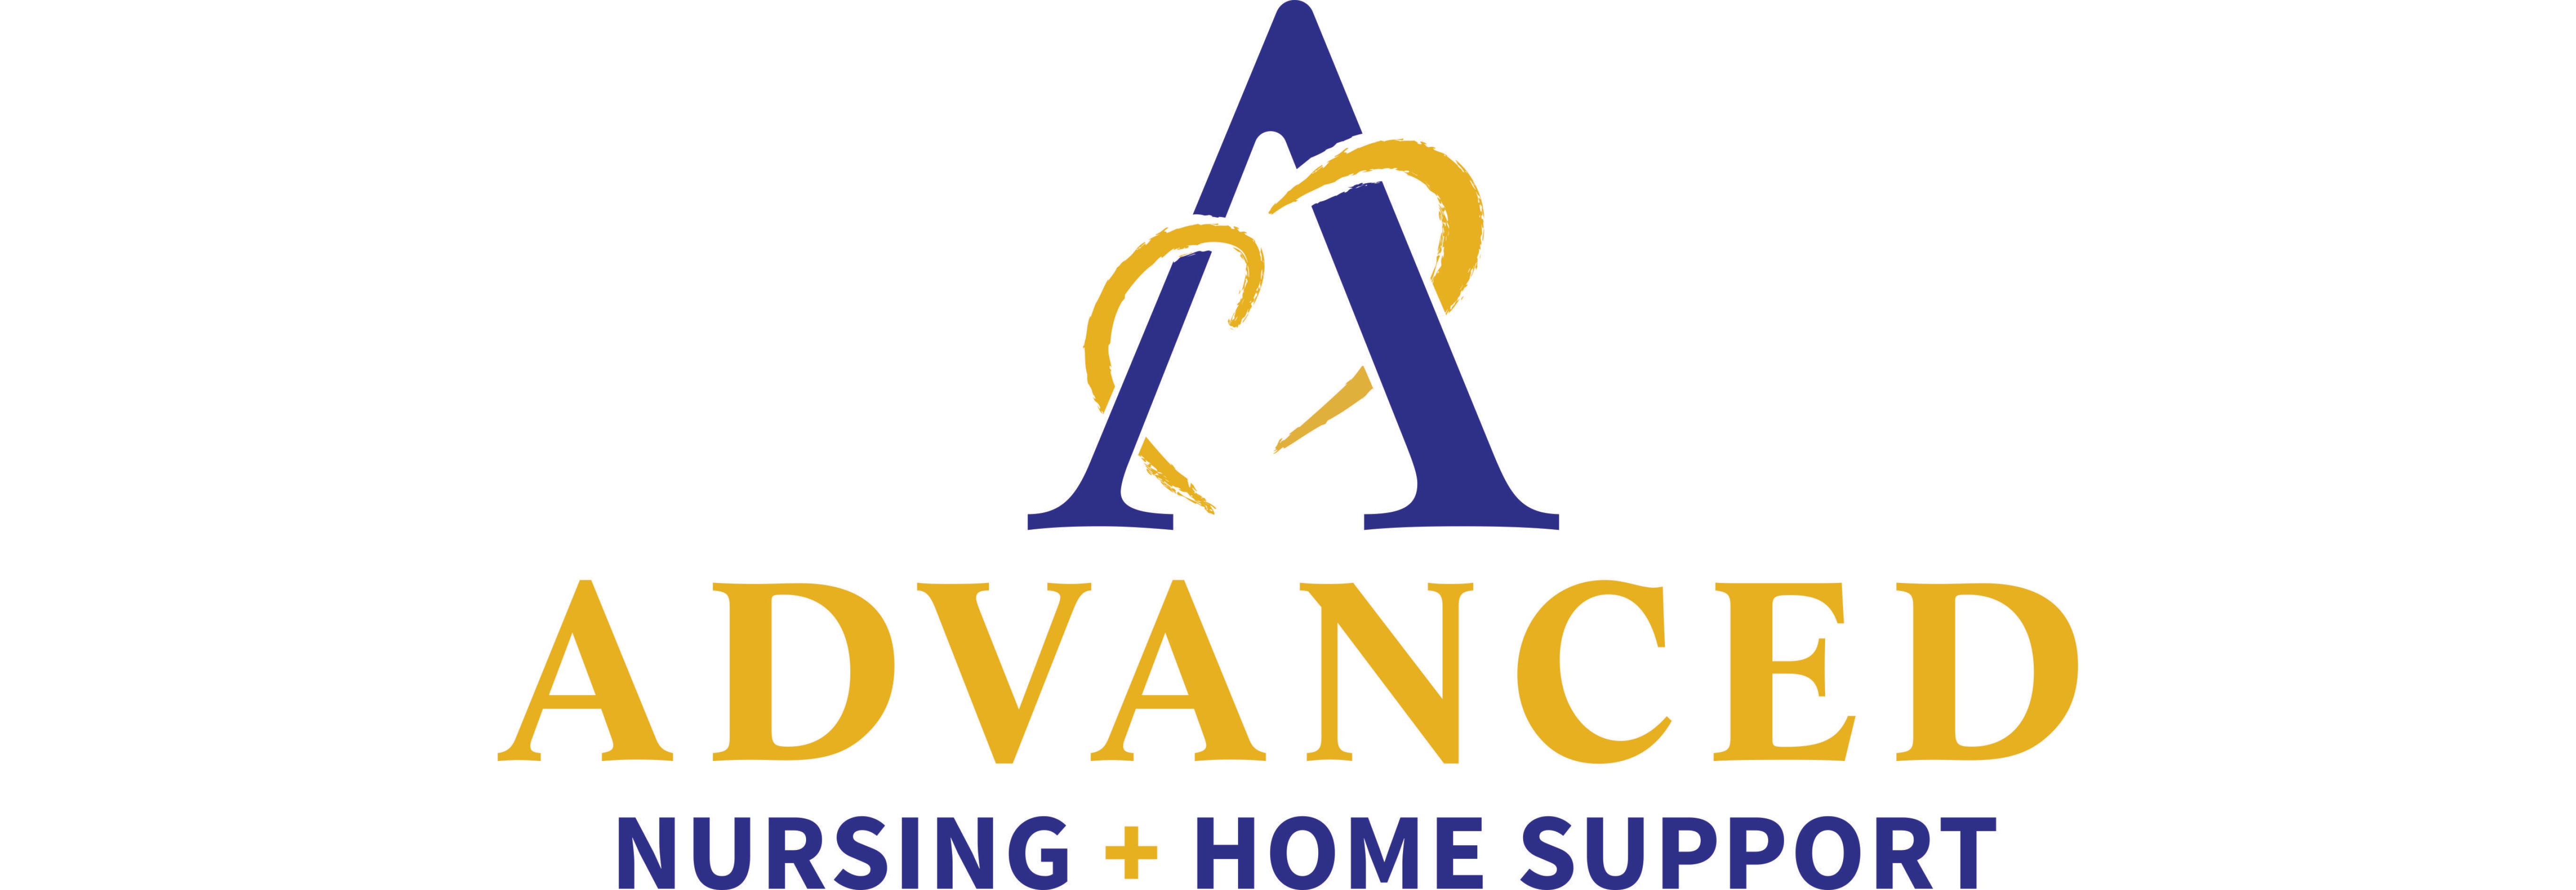 Advanced Nursing + Home Support